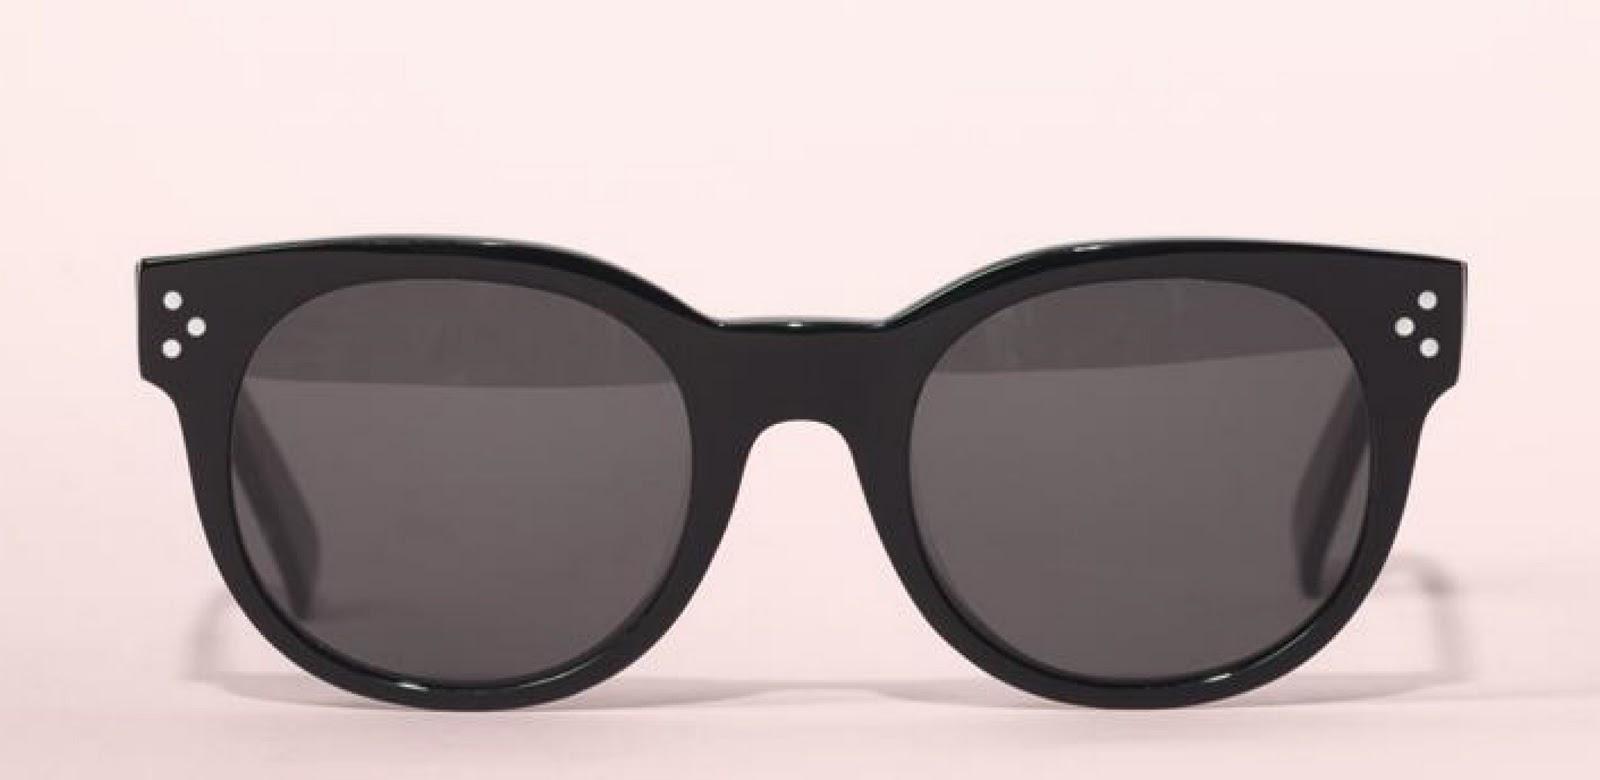 56b159d9aaa5 Celine Sunglasses Audrey